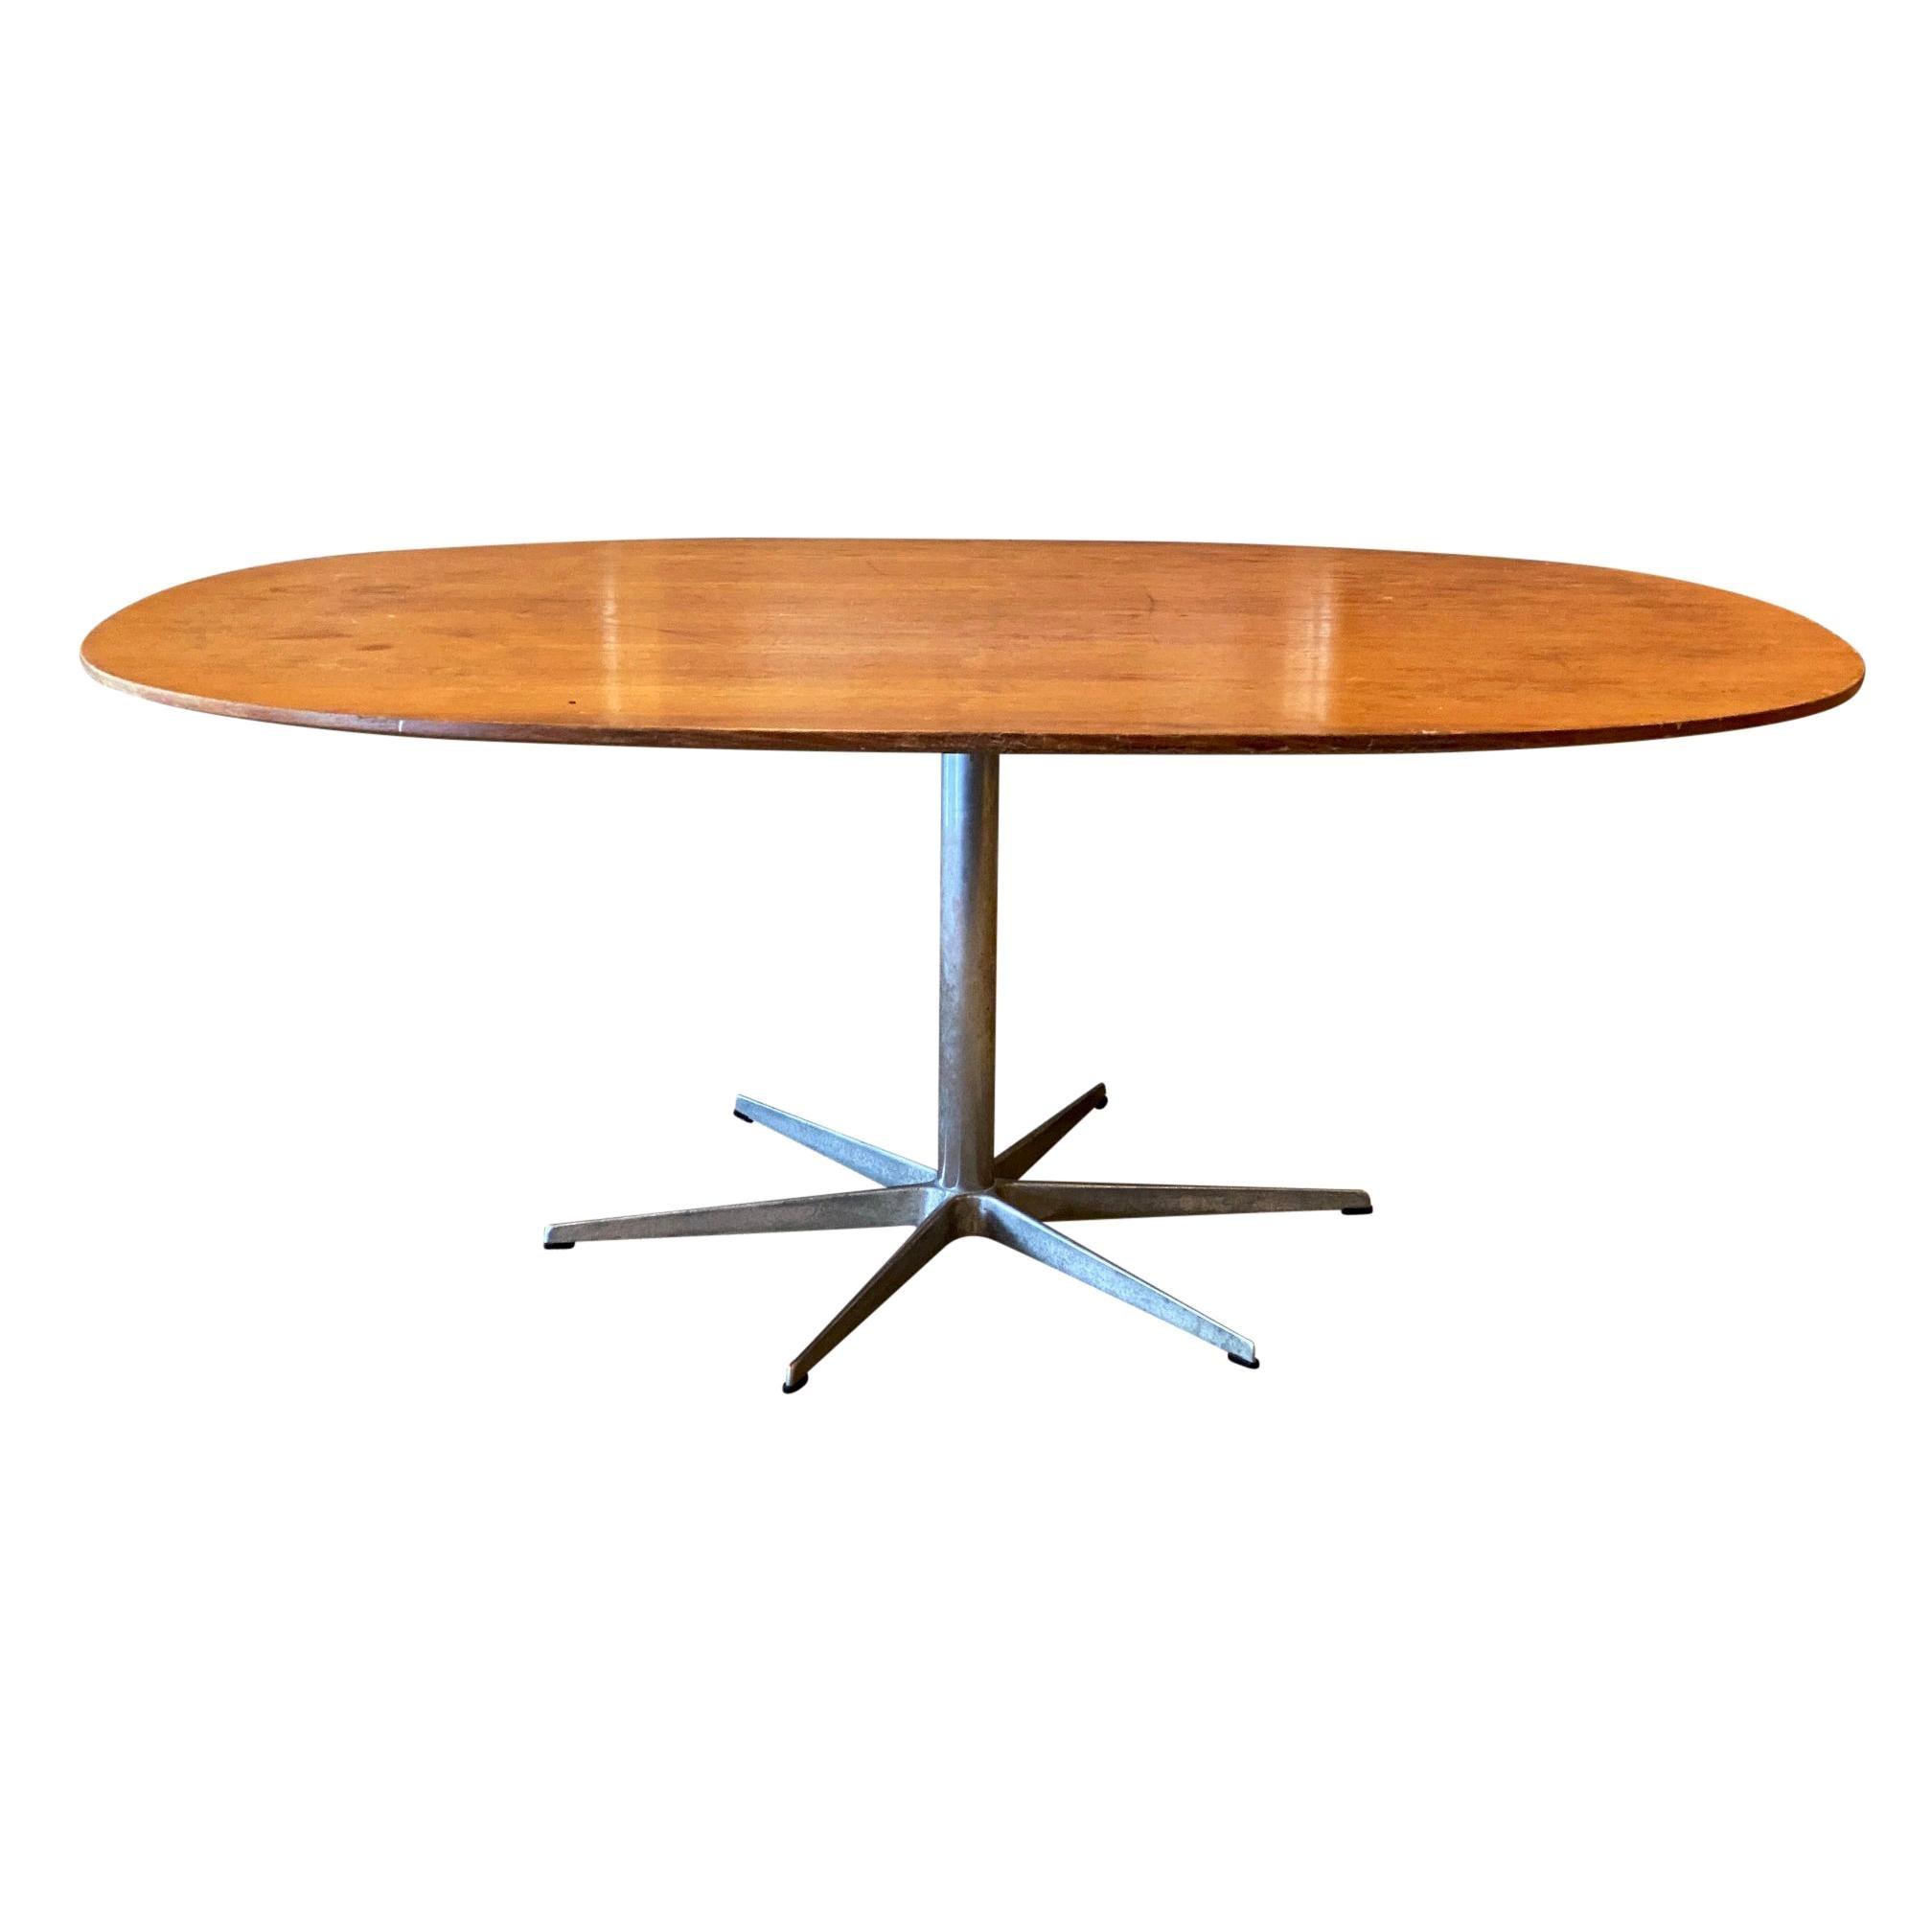 Arne Jacobsen & Piet Hein Wood Dining Table Mid-Century Modern Fritz Hansen